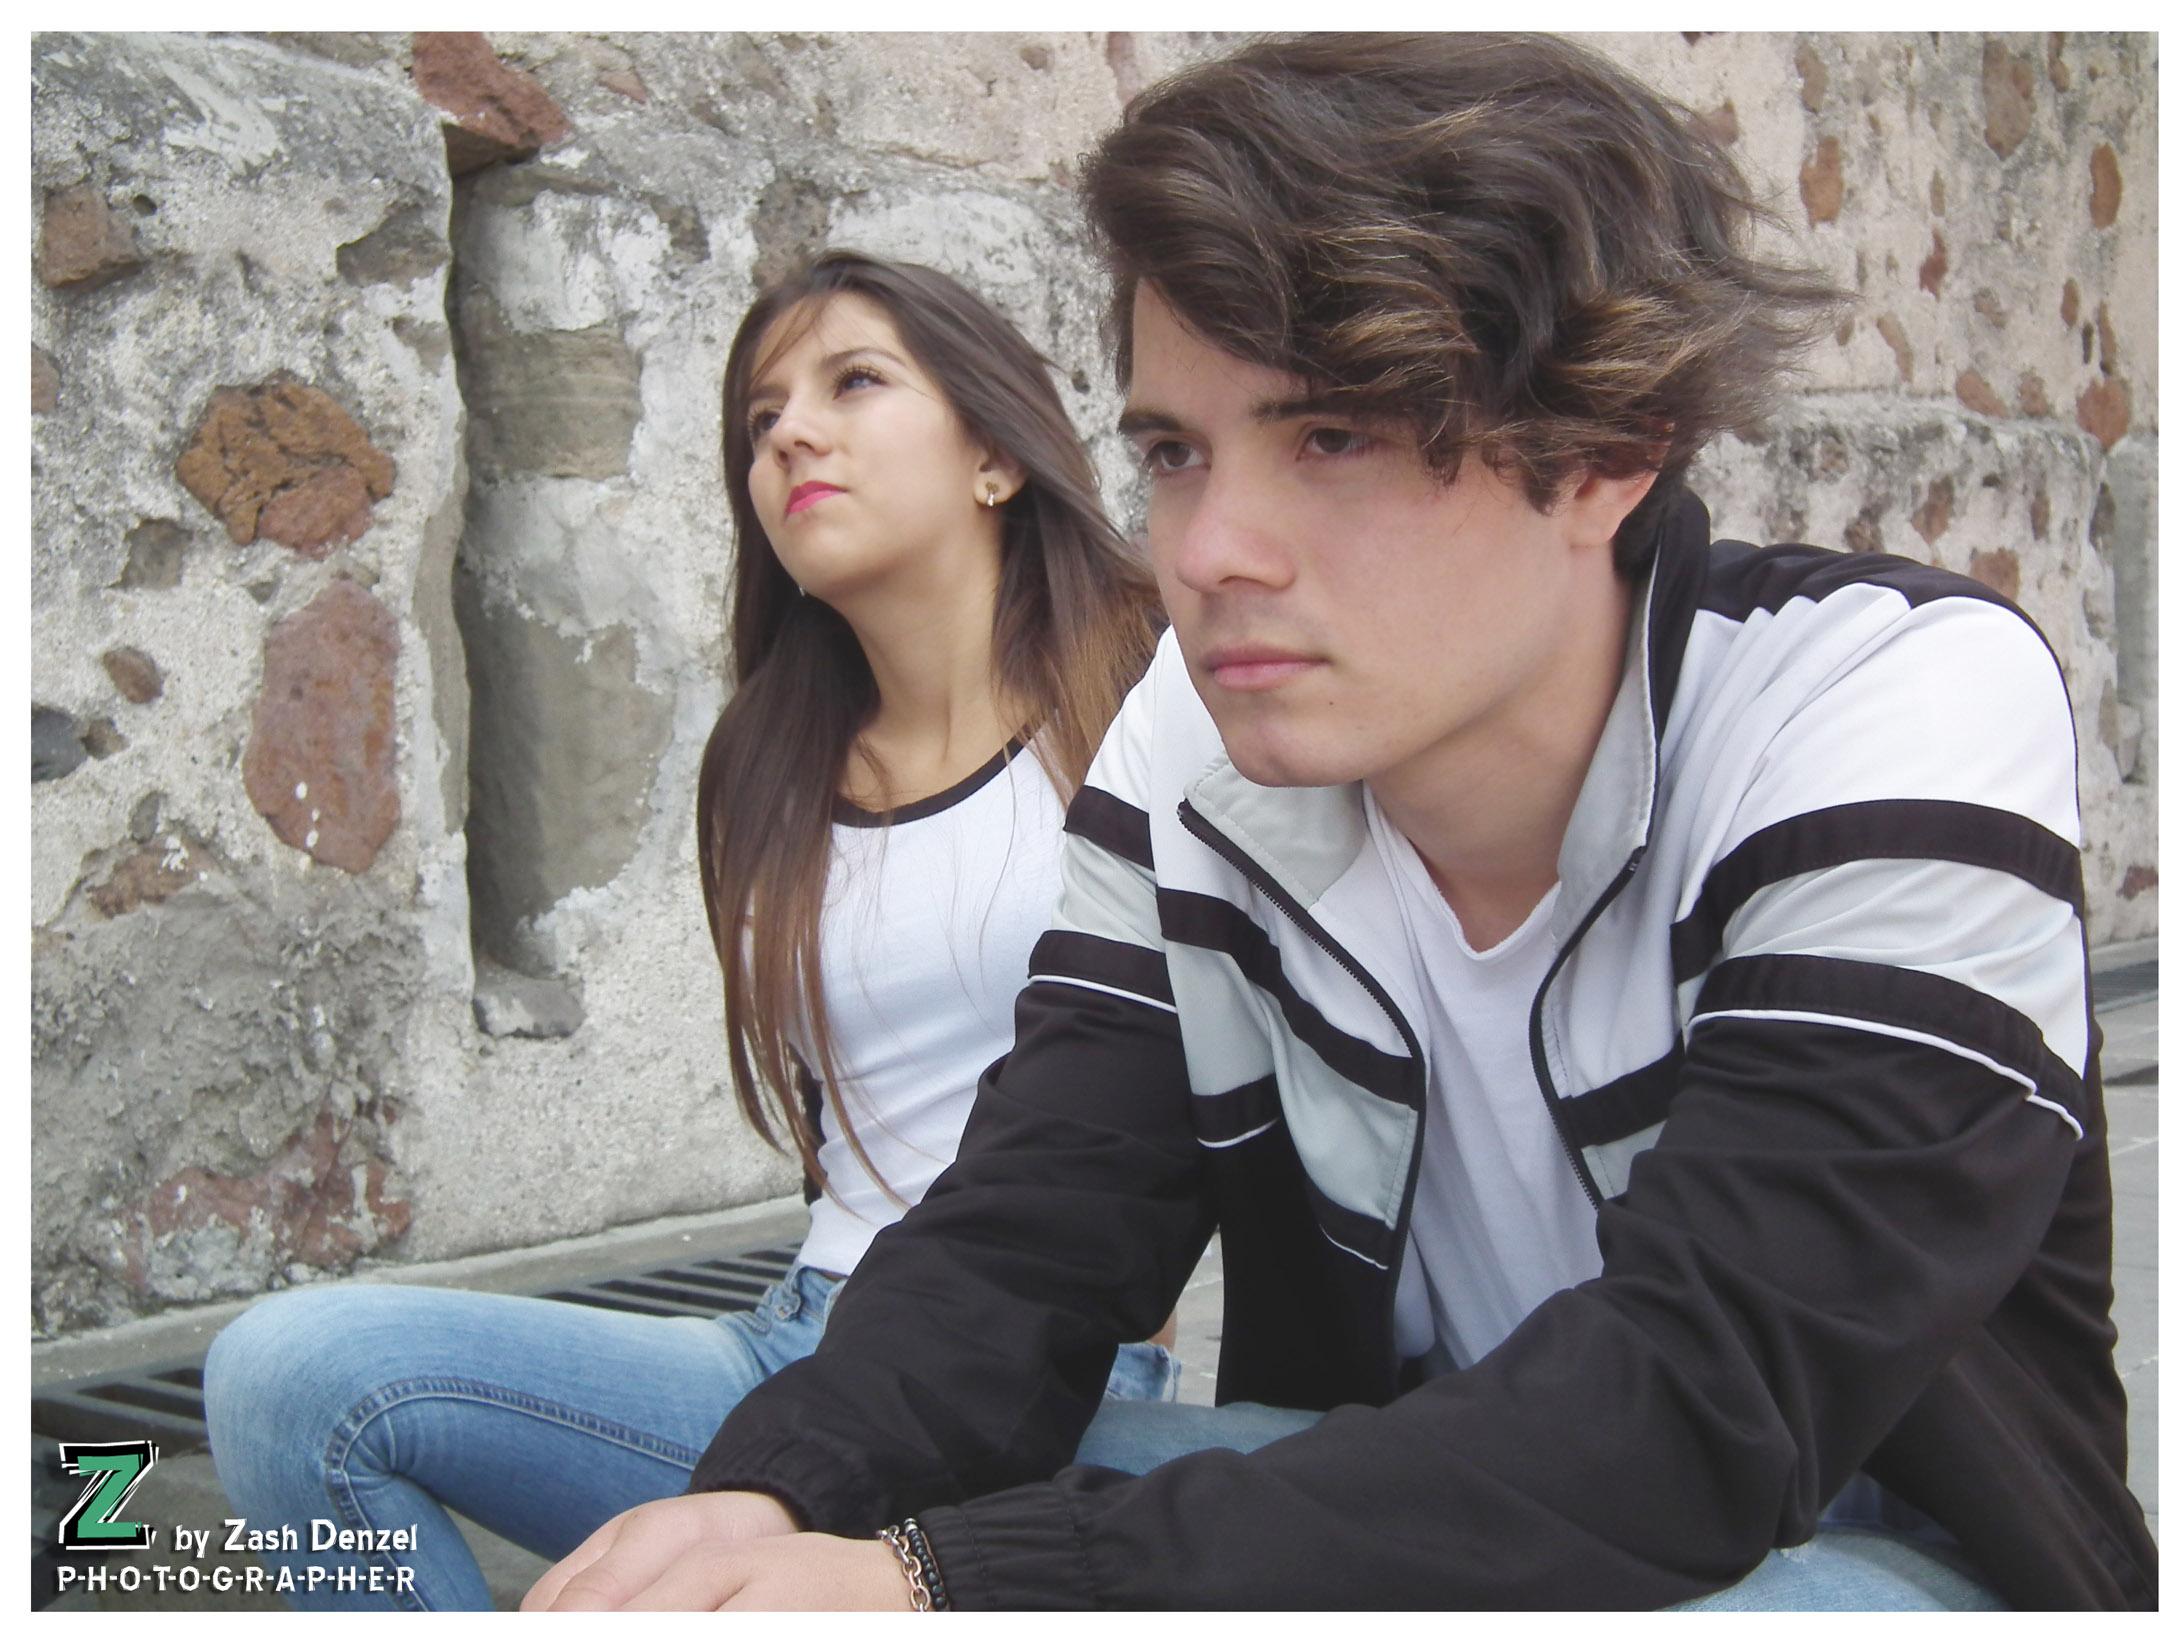 Model: Luis Morato